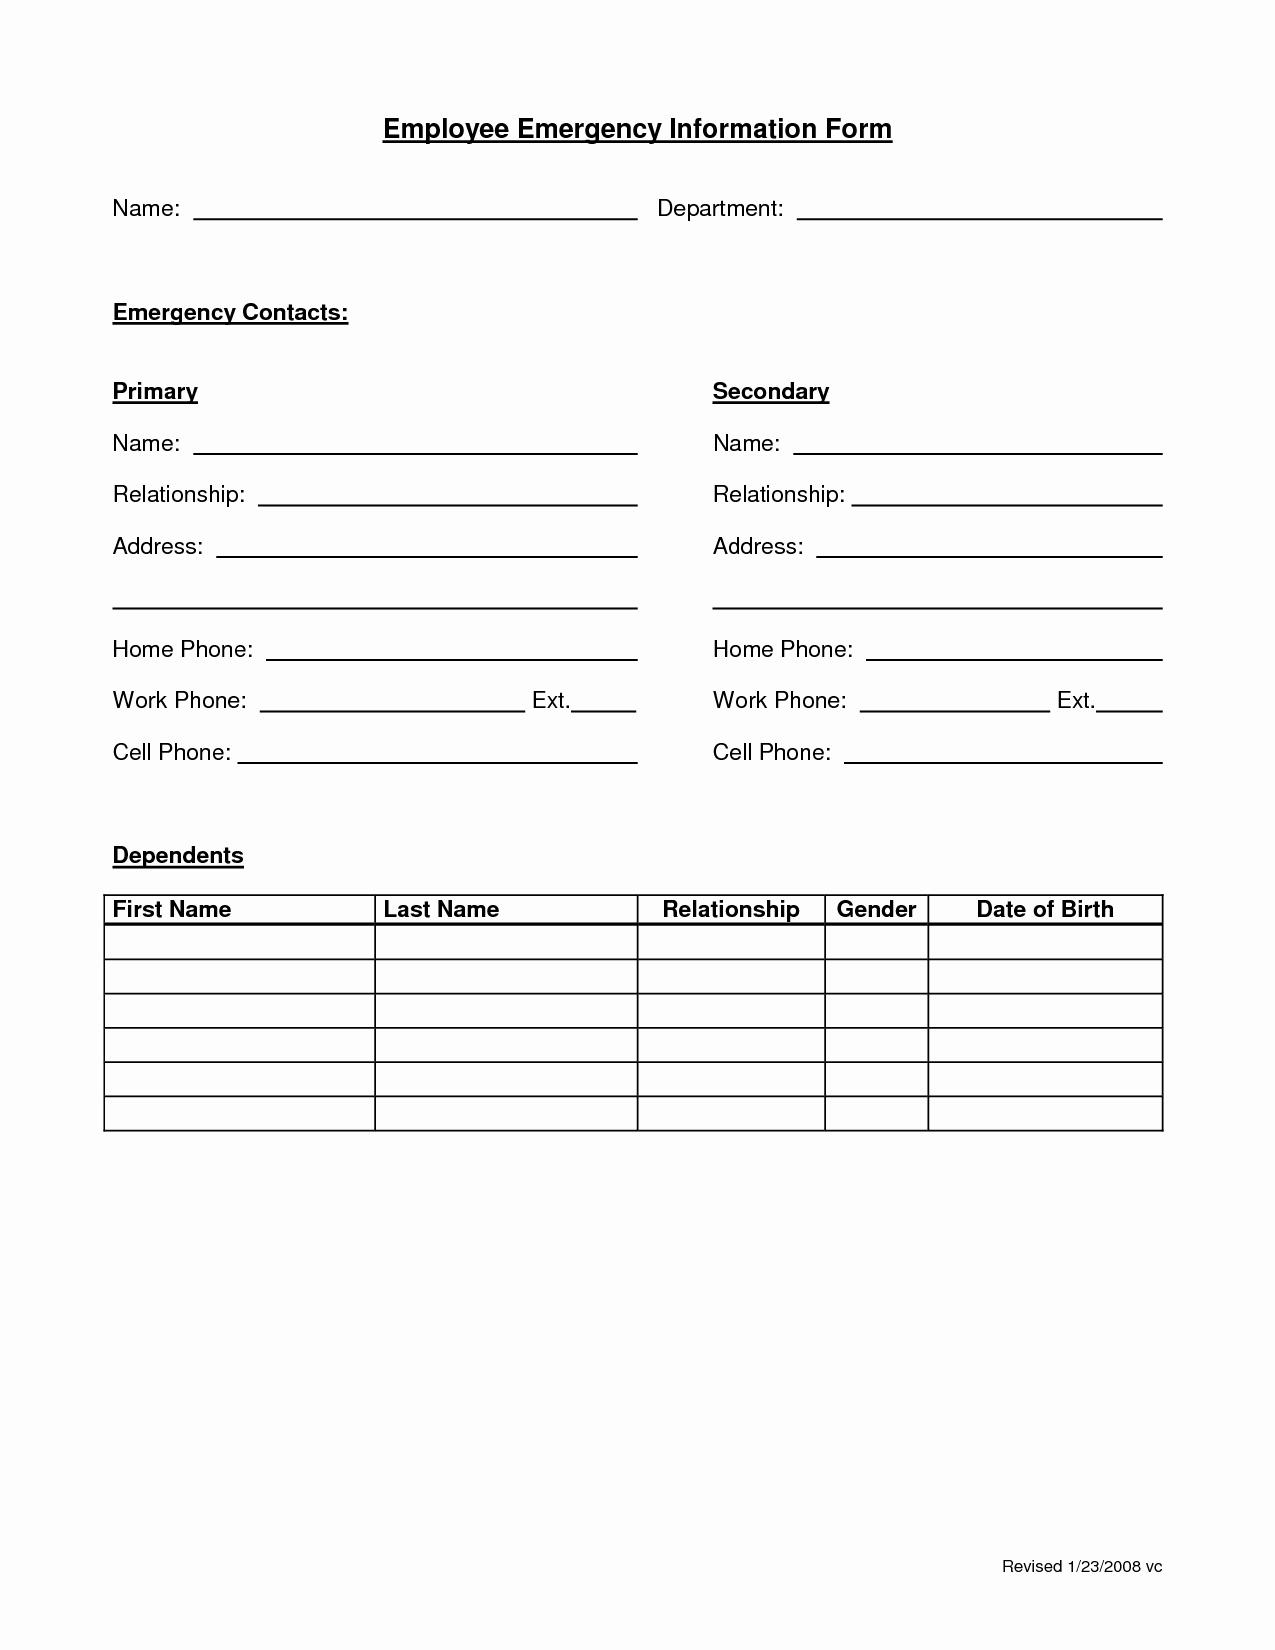 Employee Emergency Contact form Template Fresh Employee Emergency form